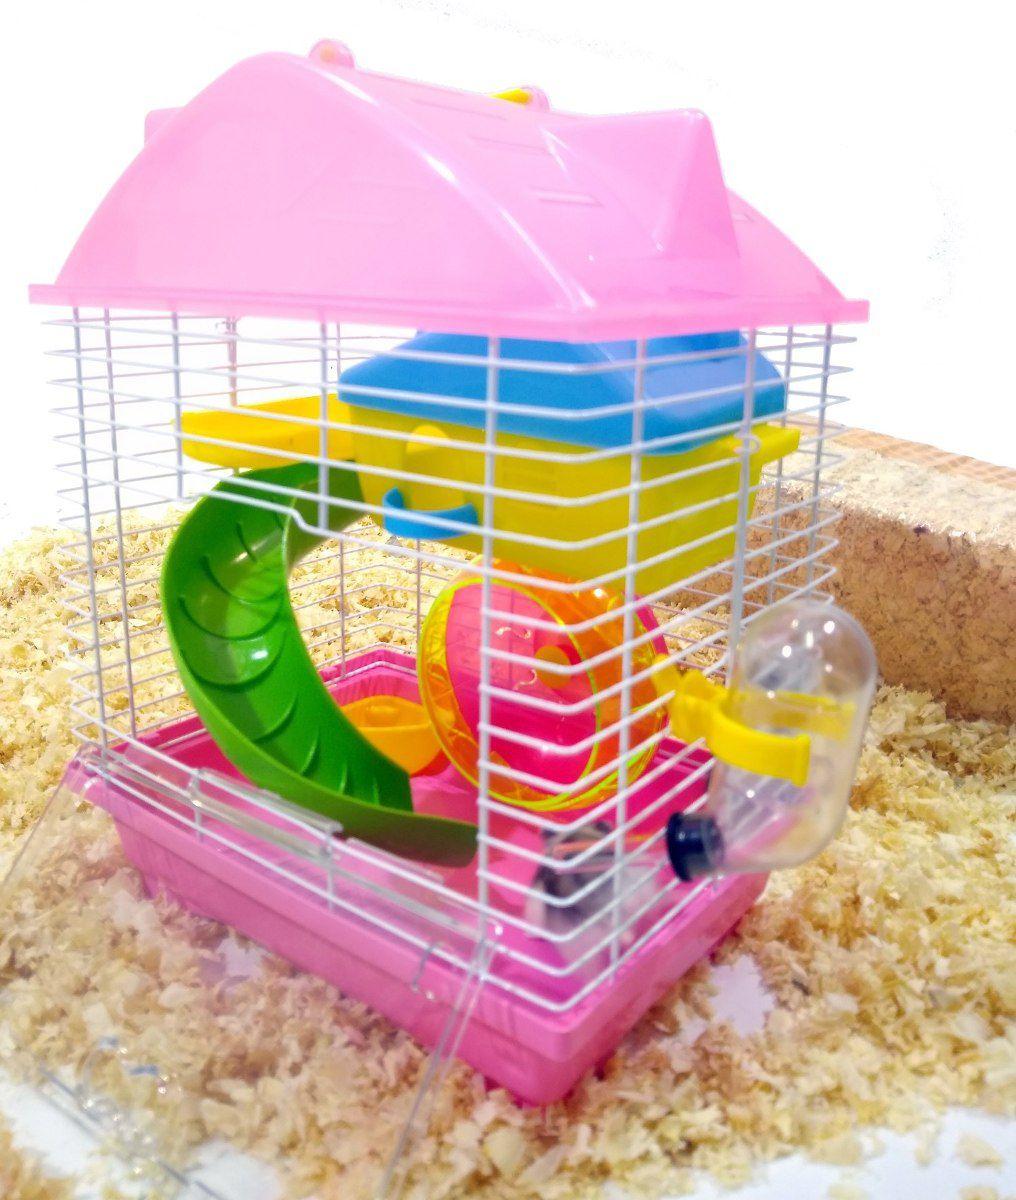 Gaiola Hamster Play Luxo Mix - Rosa - 23cm x 17cm x 30cm